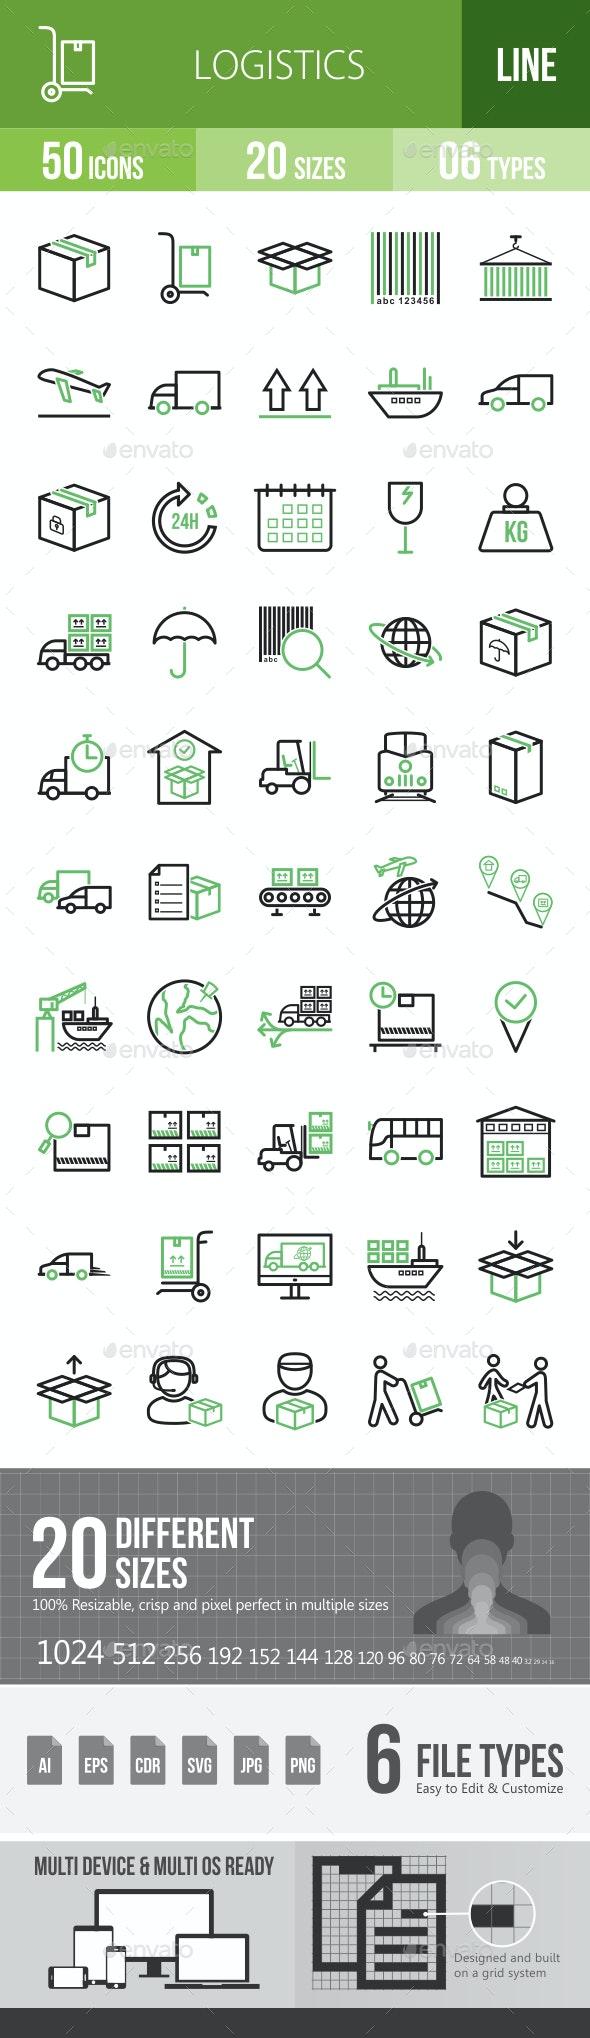 Logistics Line Green & Black Icons - Icons